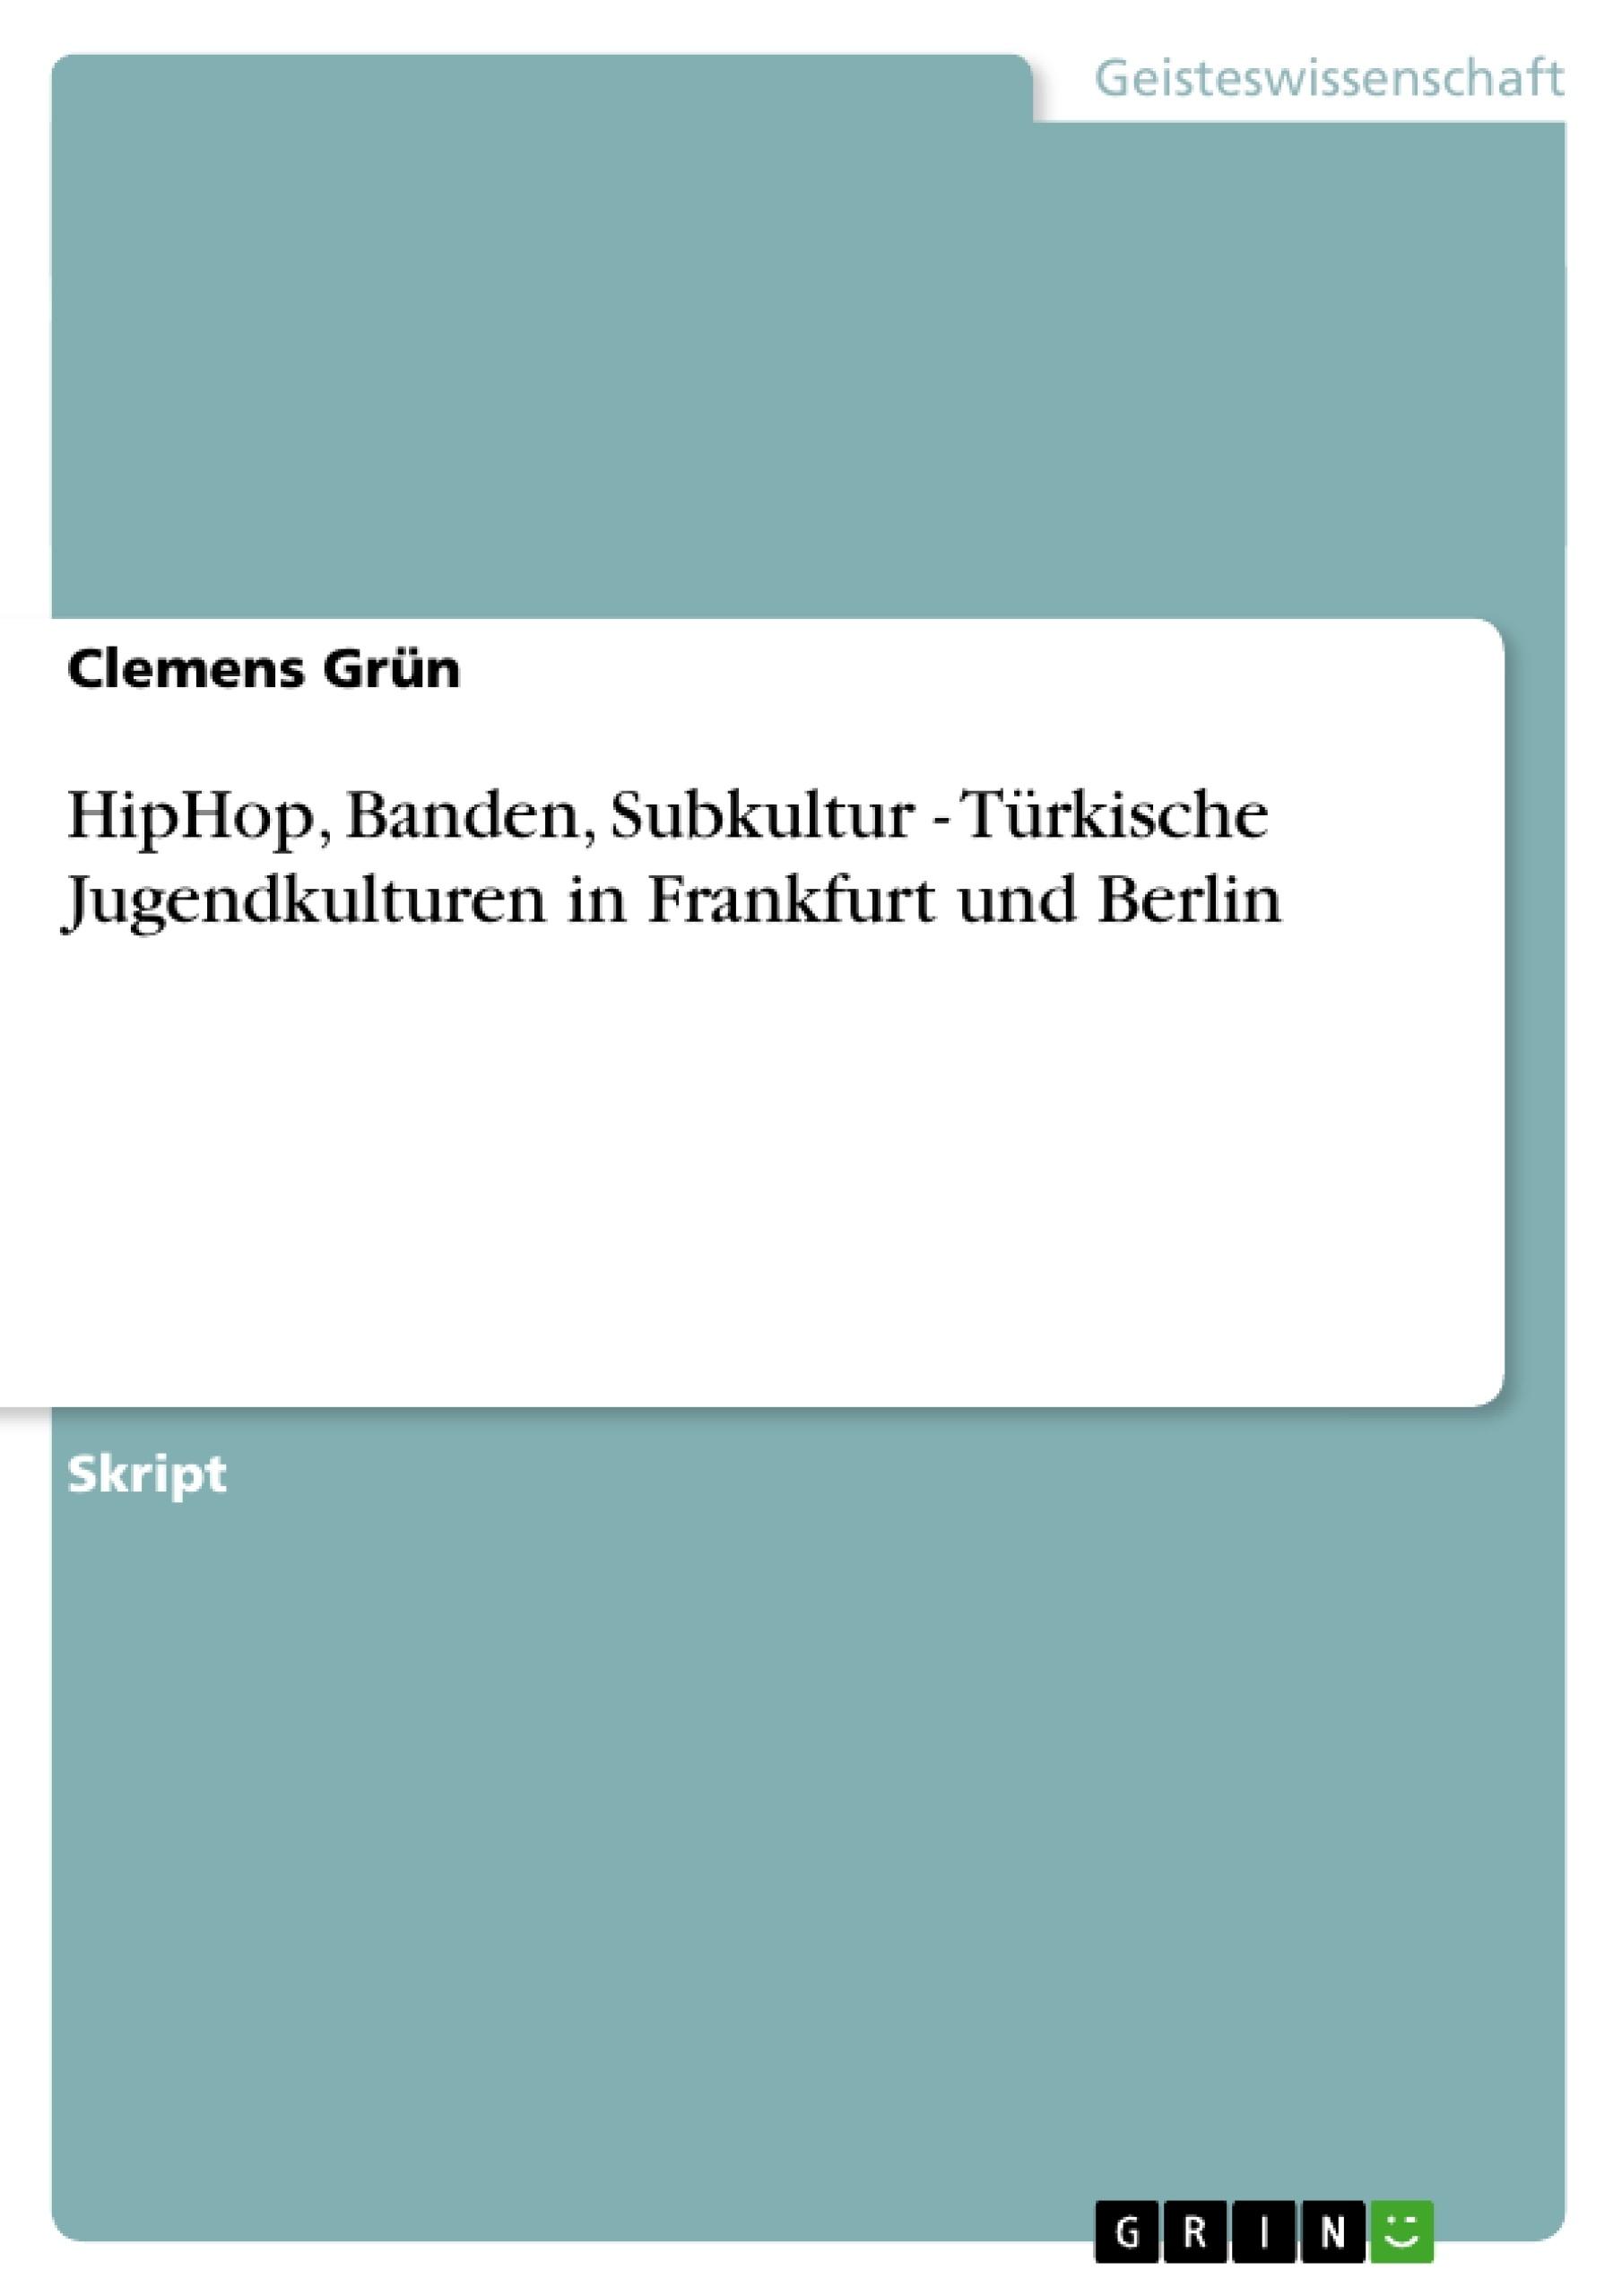 Titel: HipHop, Banden, Subkultur - Türkische Jugendkulturen in Frankfurt und Berlin